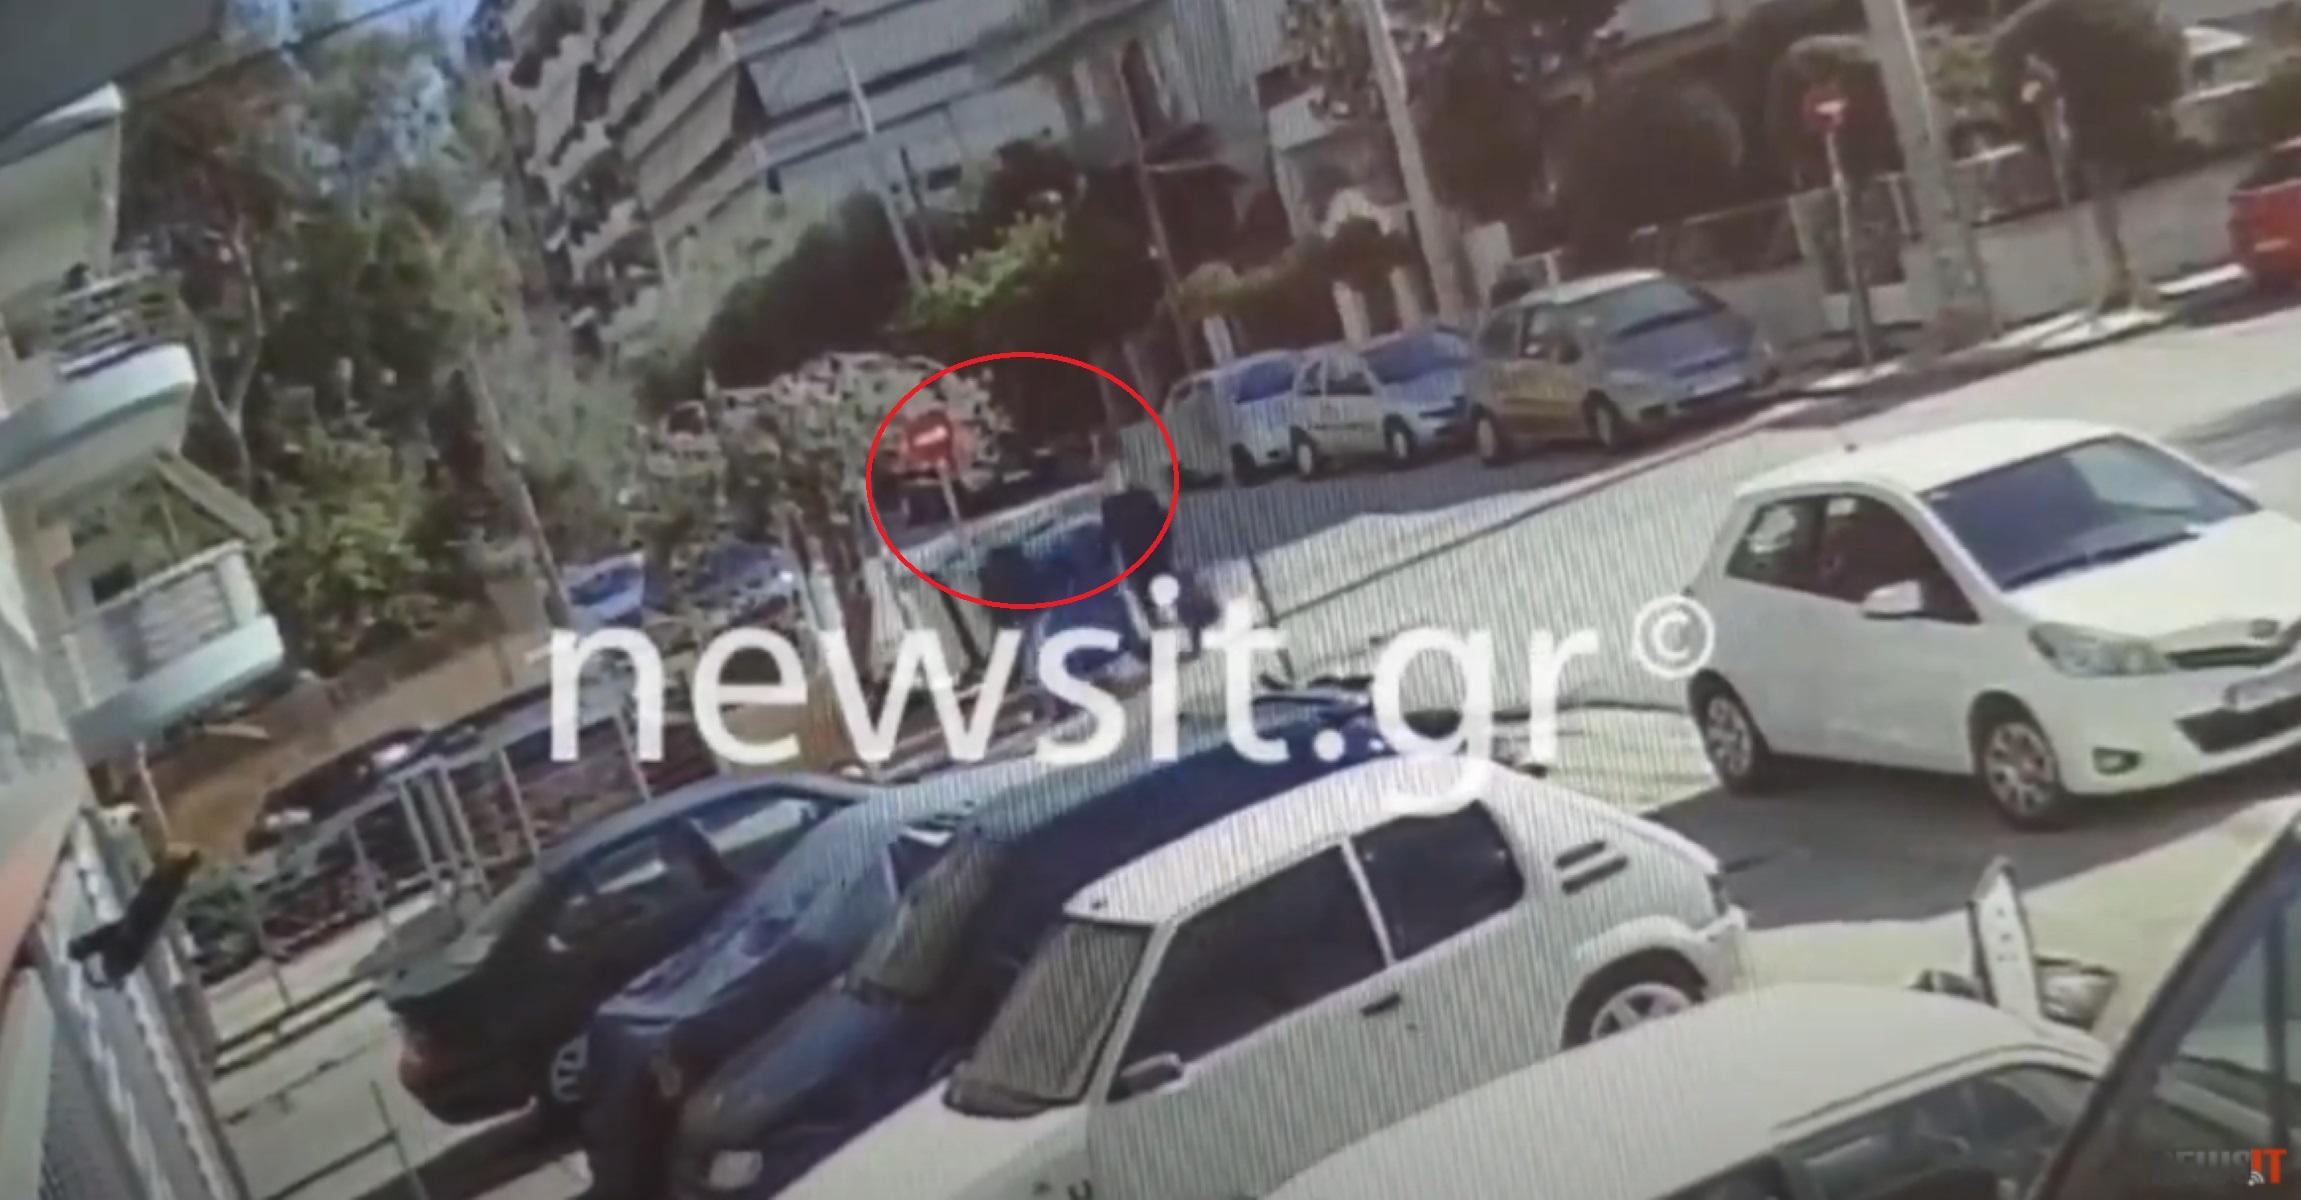 Video ντοκουμέντα: Έτσι χτυπούσε η συμμορία με τον αρχηγό «φάντασμα» που είχε αλλάξει τα δακτυλικά του αποτυπώματα